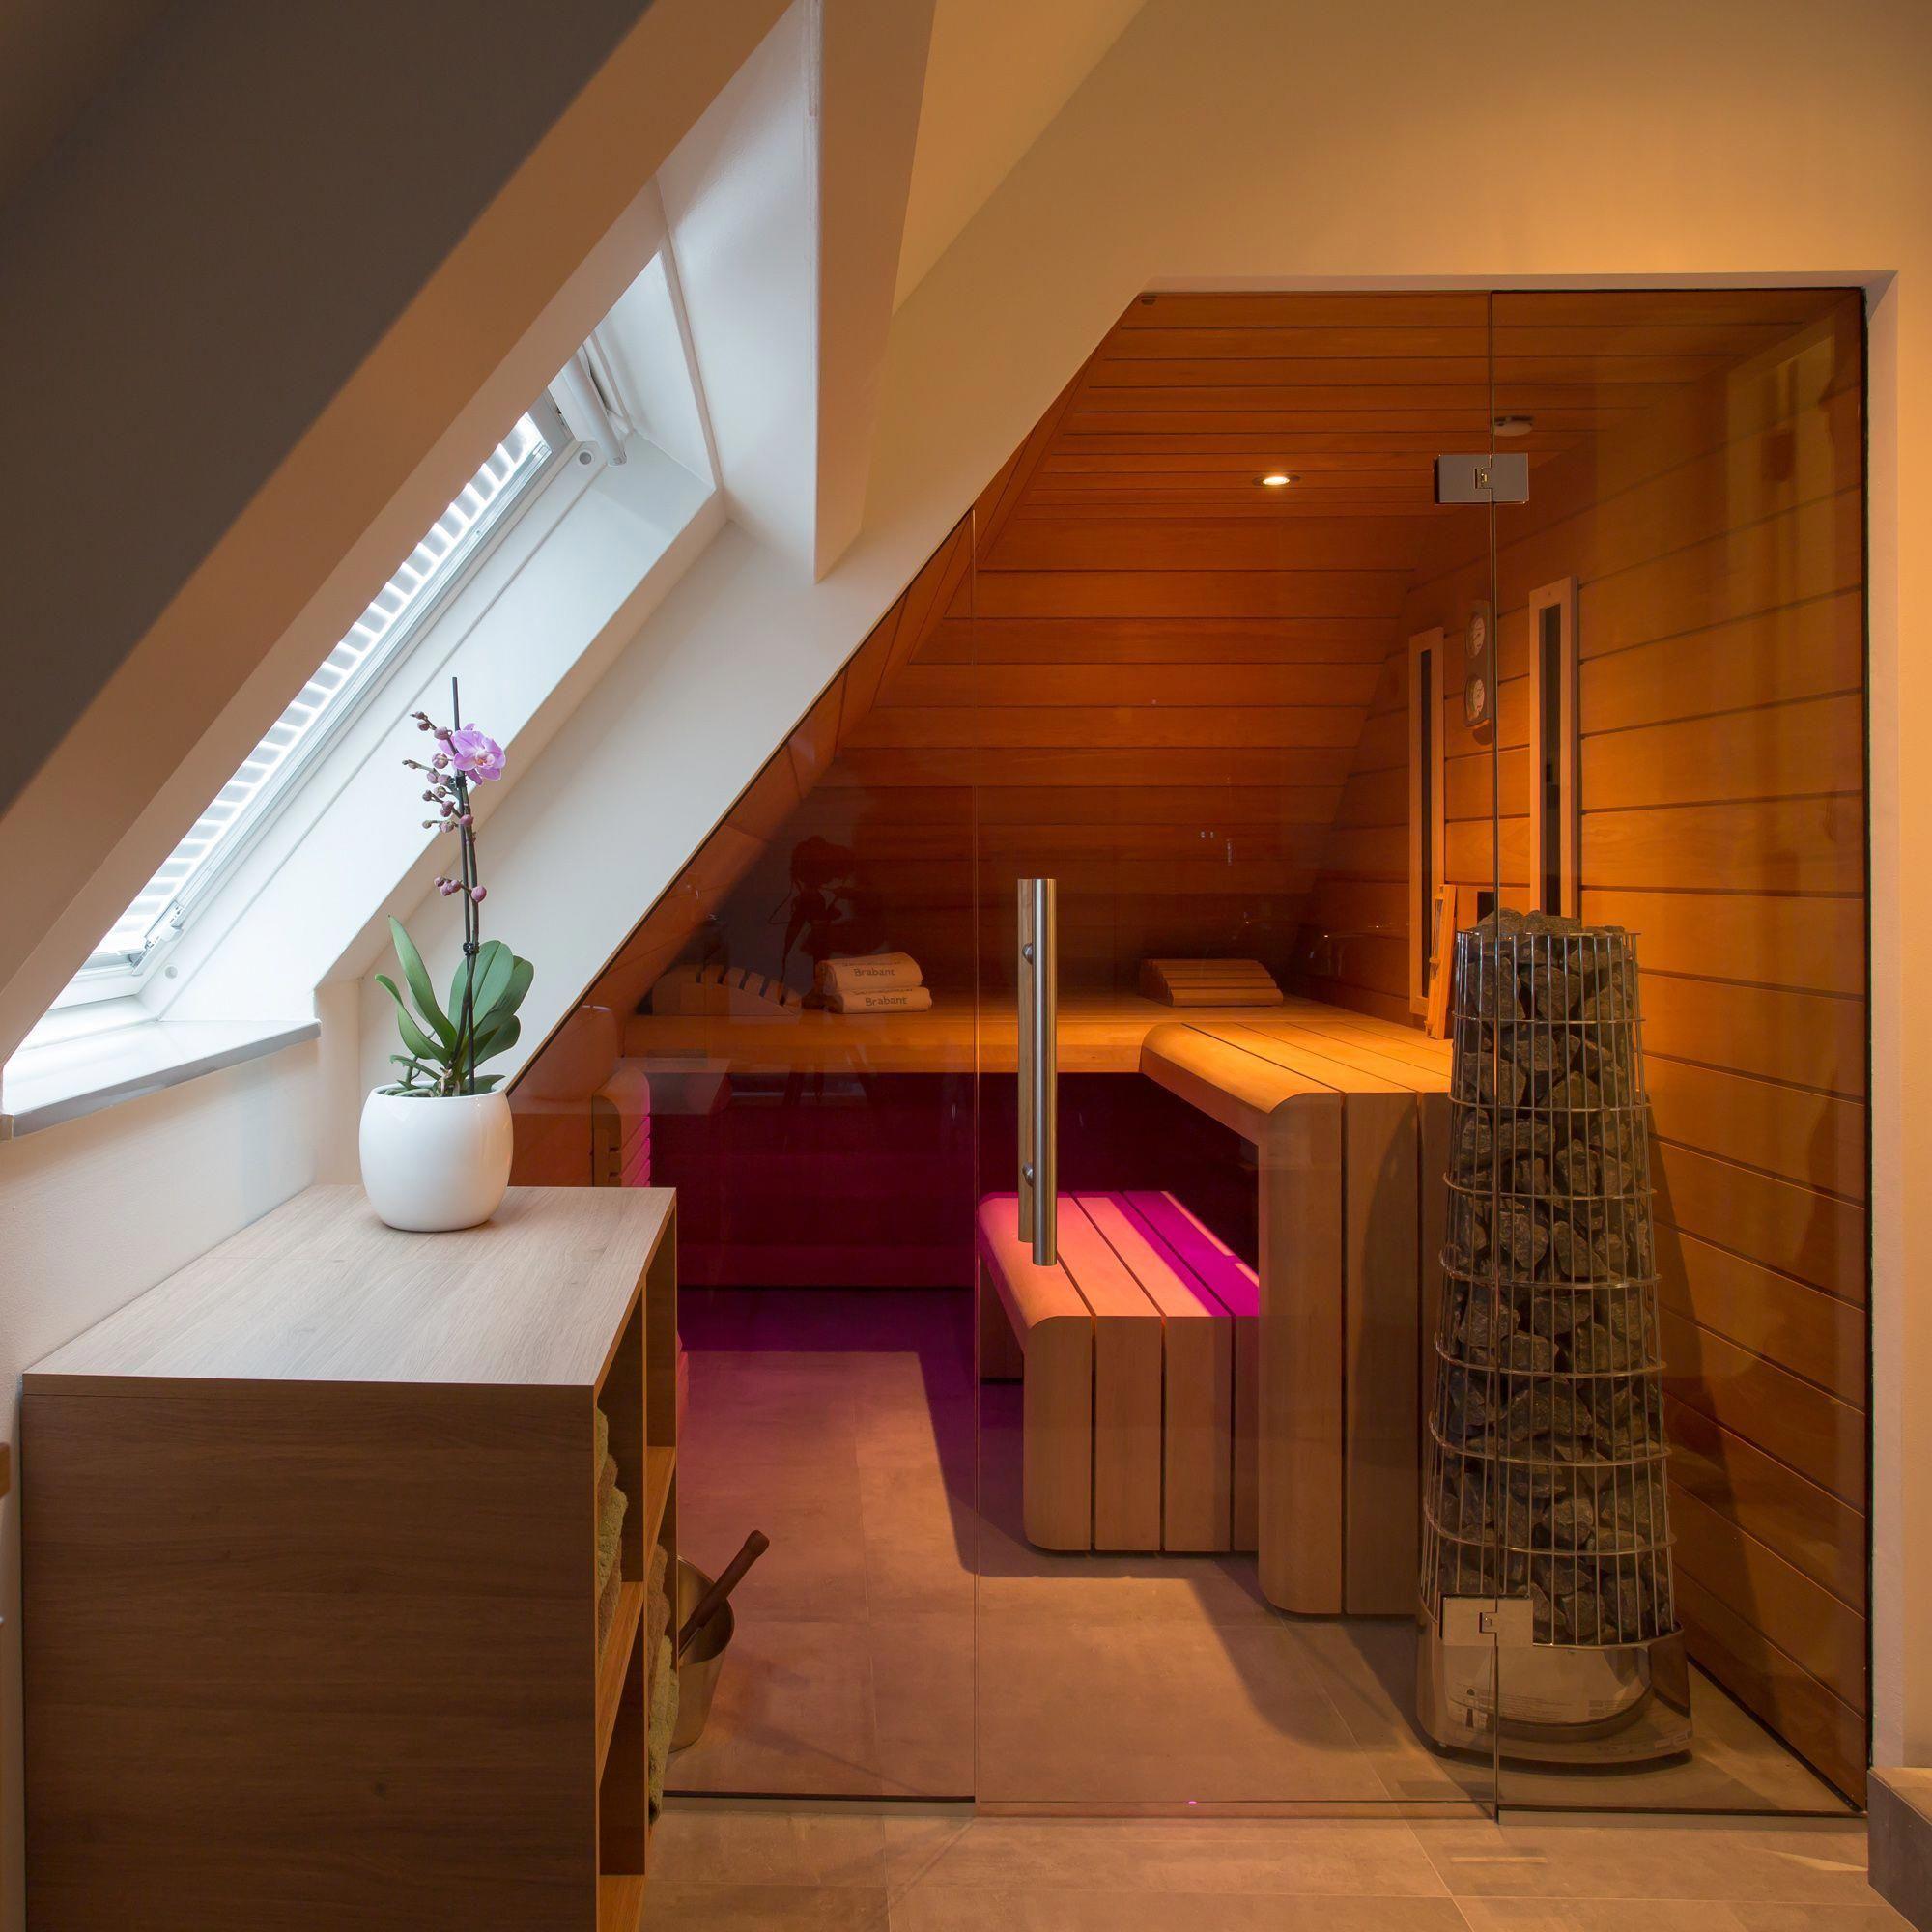 Learn More At The Web Click The Link For Further Options Sauna Dome Sauna Design Sauna Room Sauna